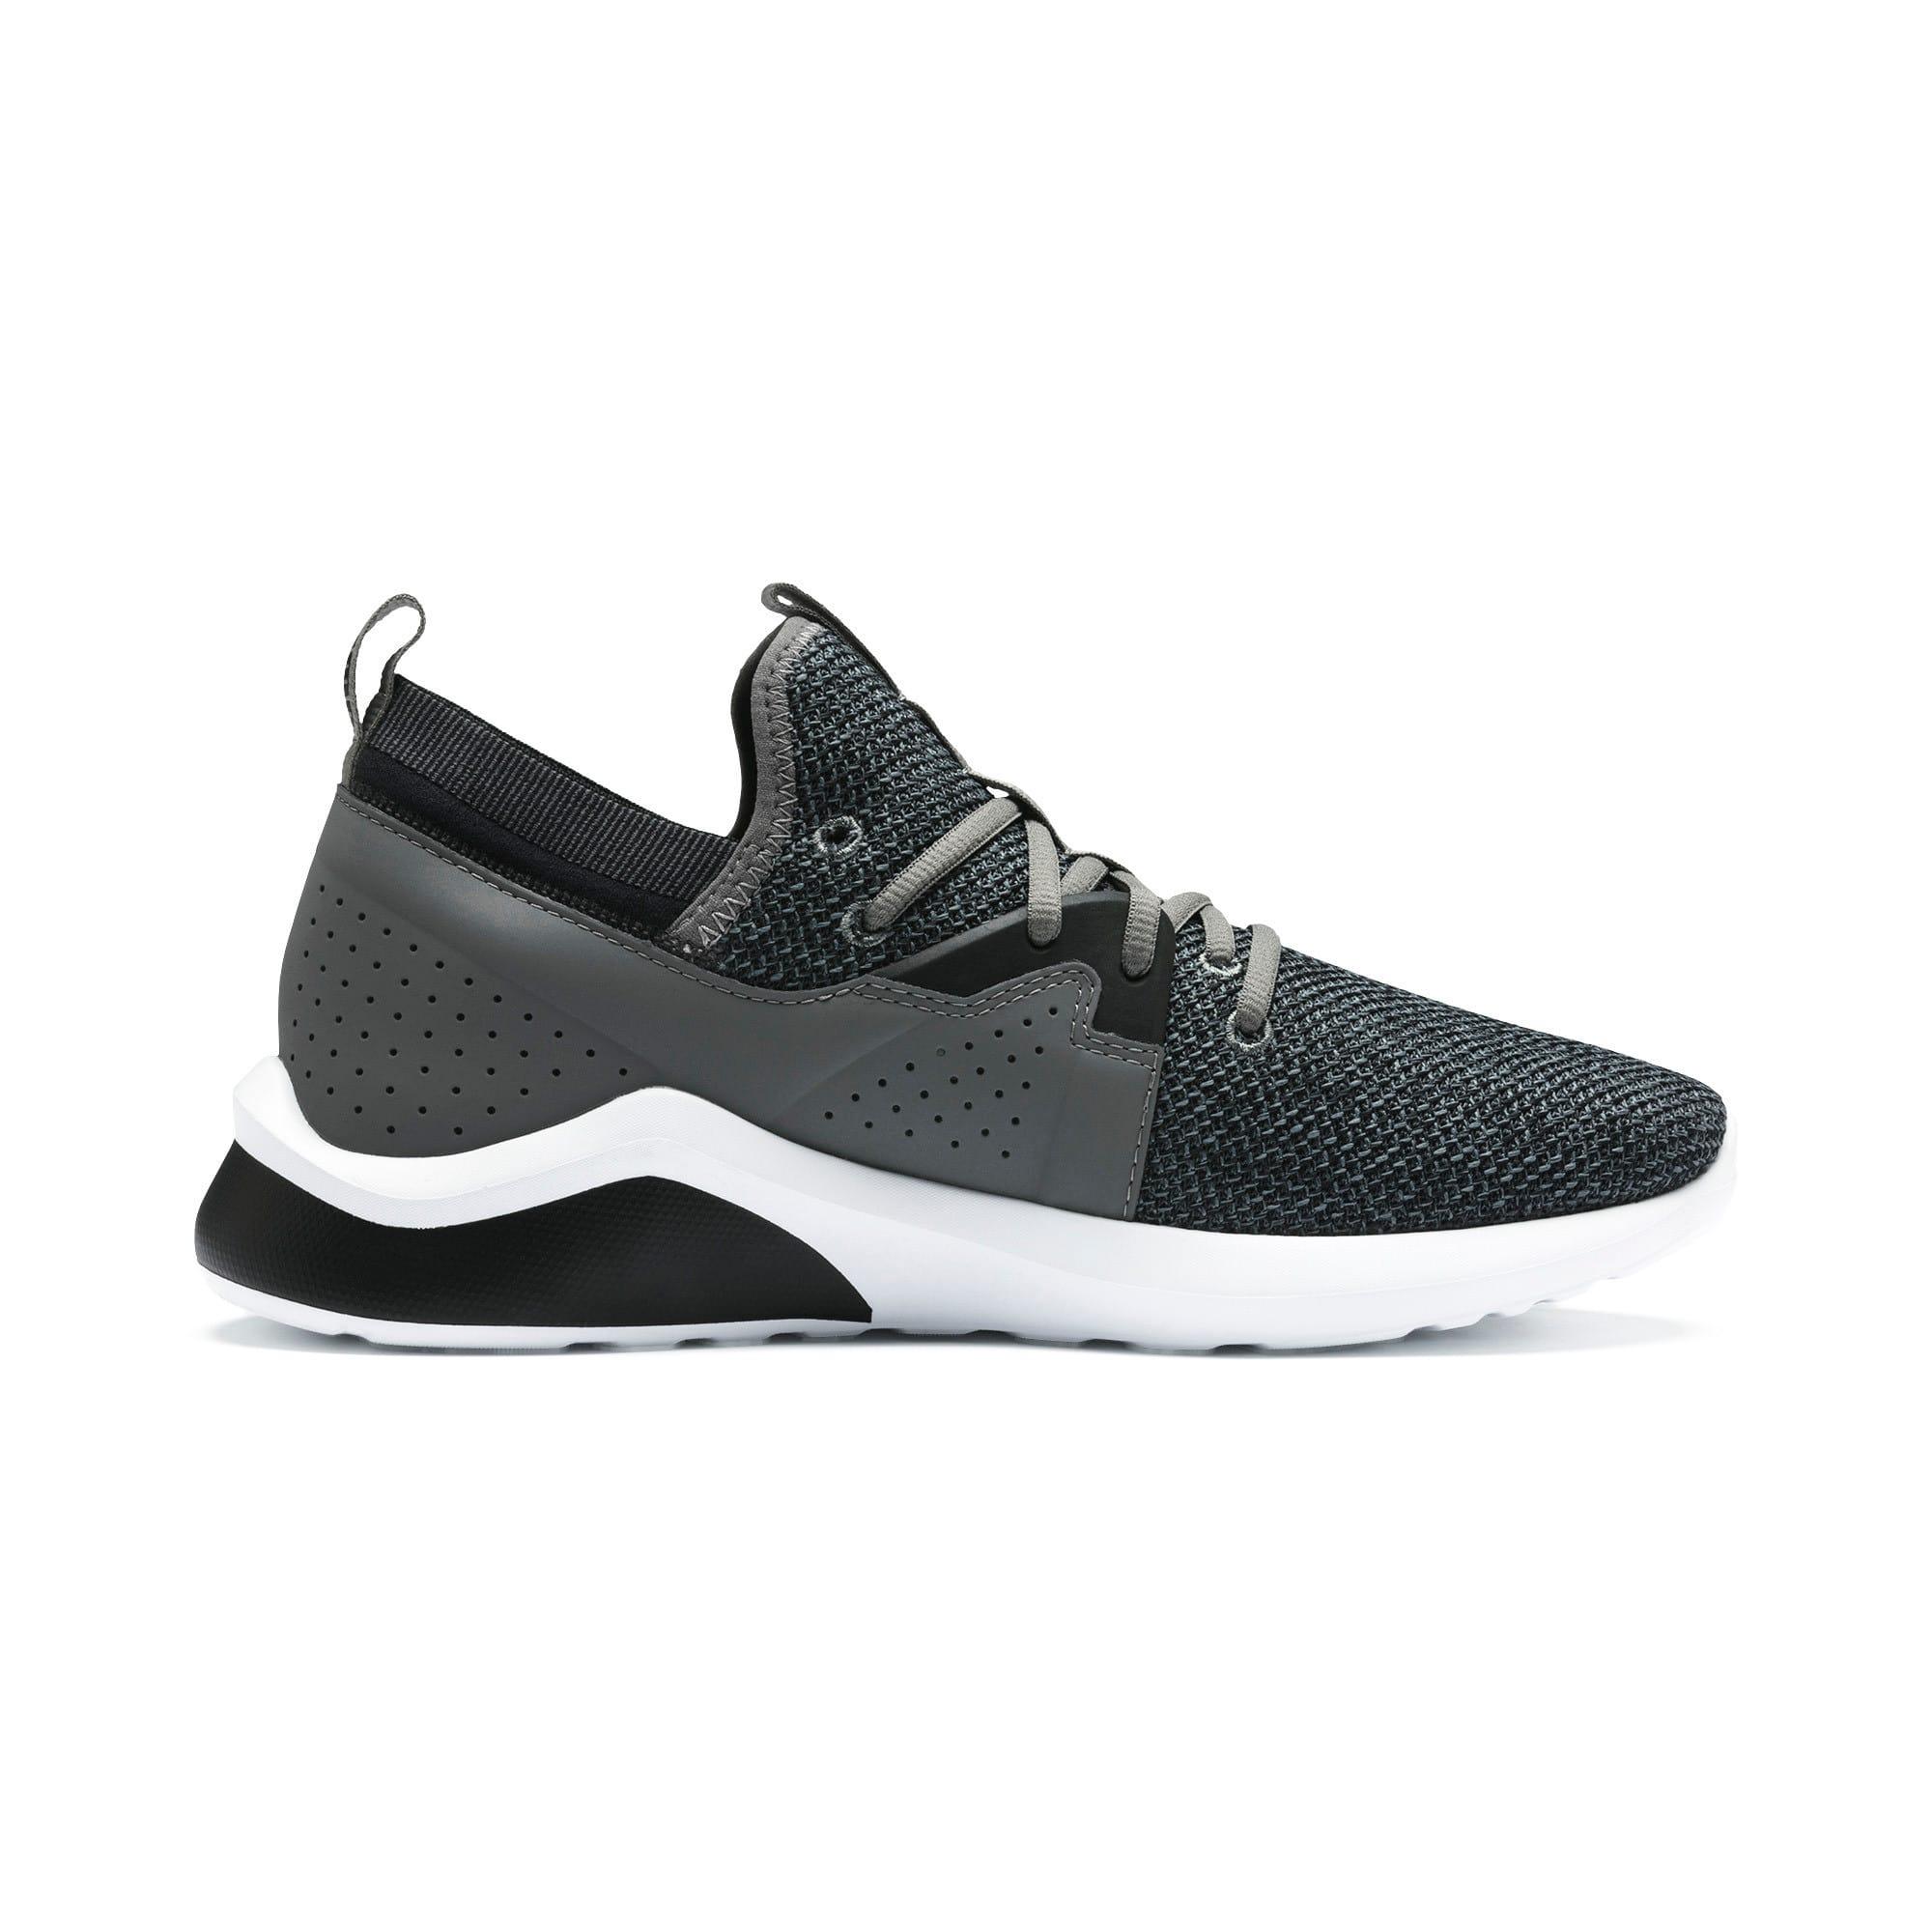 Thumbnail 7 of Emergence Men's Running Shoes, CASTLEROCK-Puma Black, medium-IND